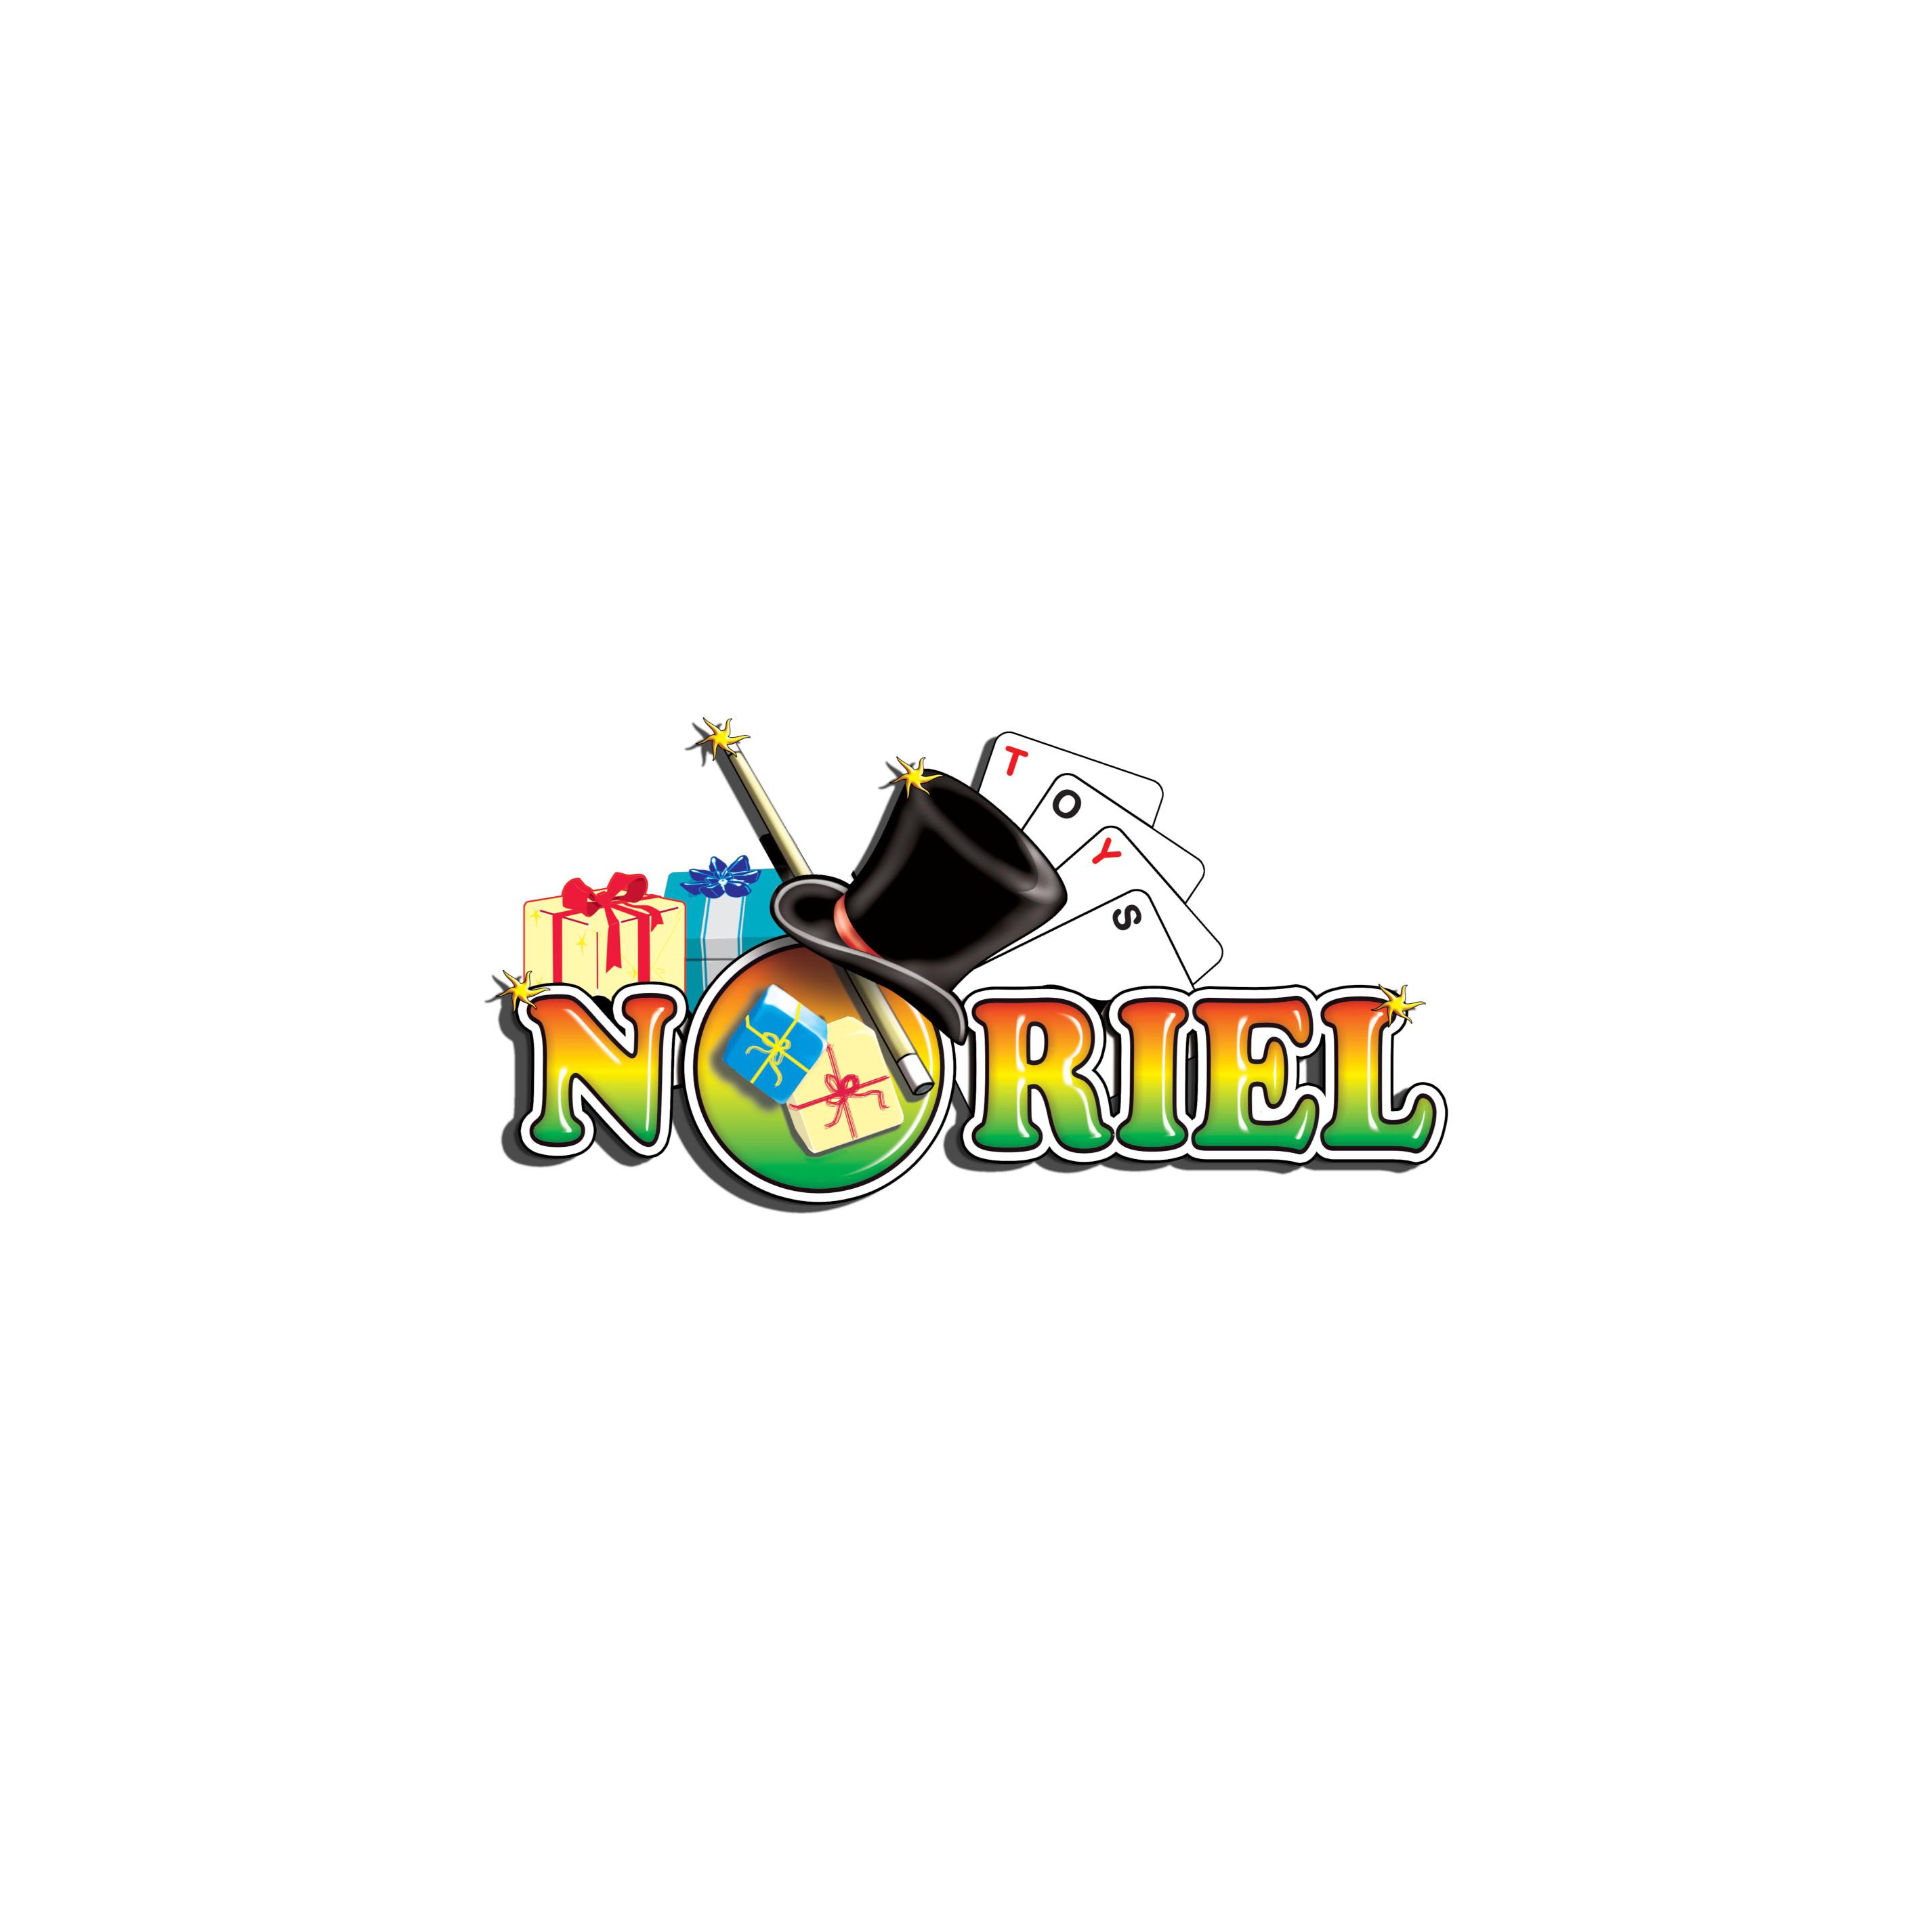 Joc interactiv Noriel - Rechinul Hat - INT6499_001